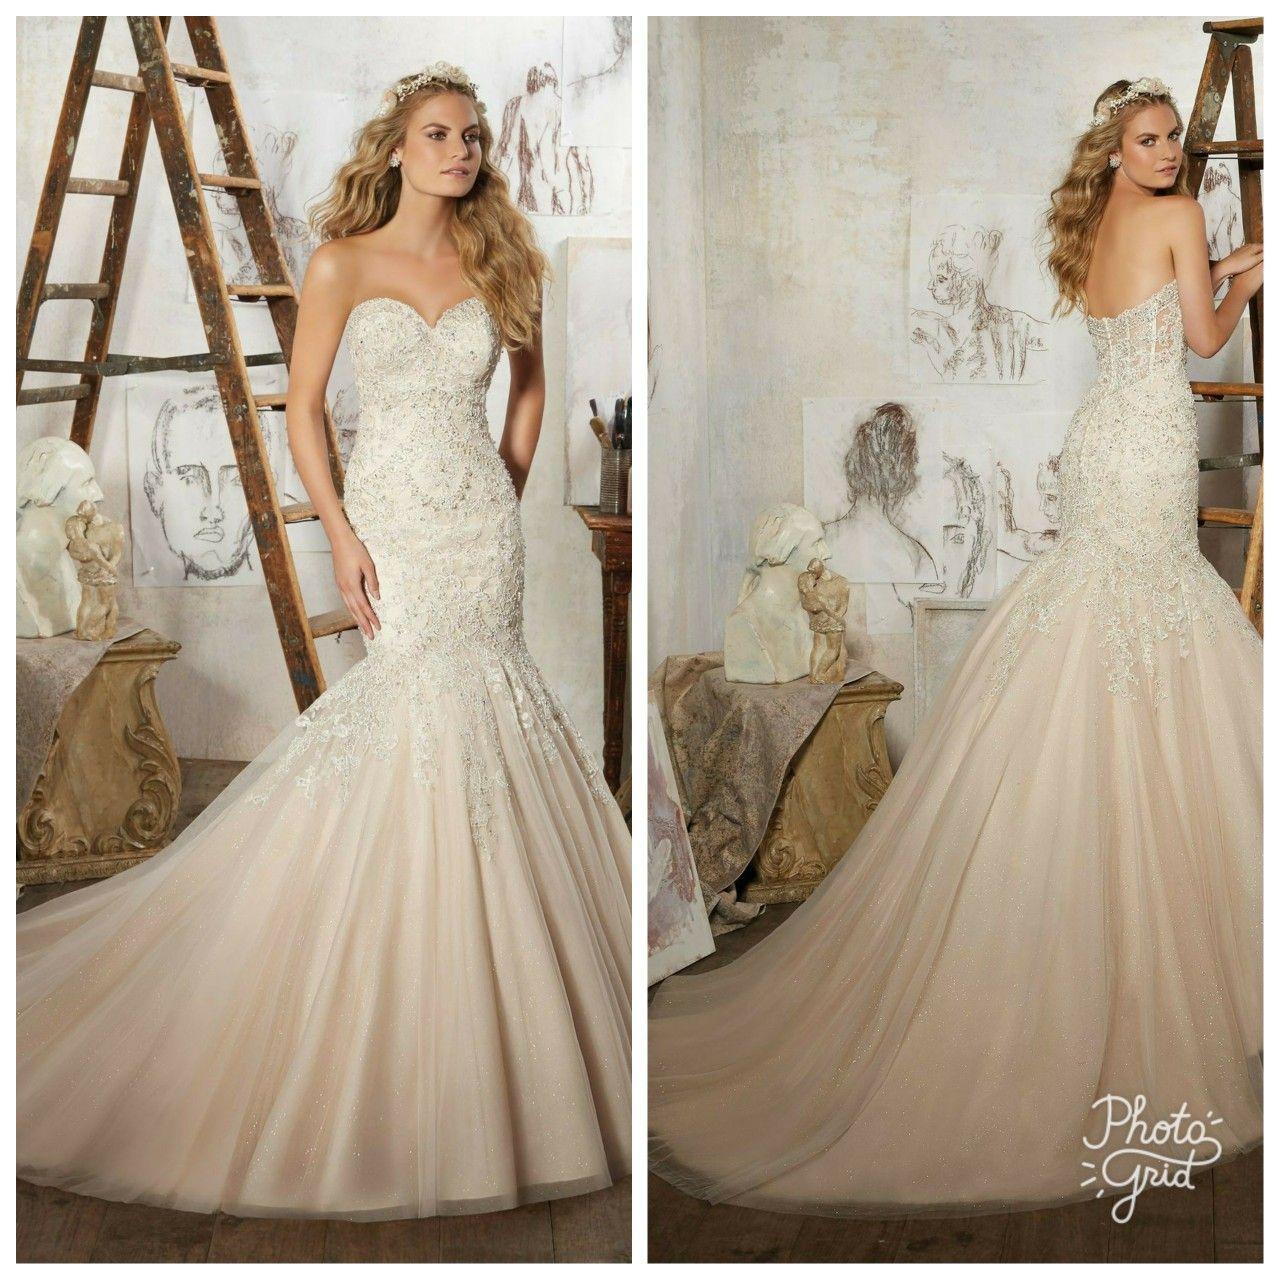 Mermaid wedding dress, sparkle wedding dress, beaded